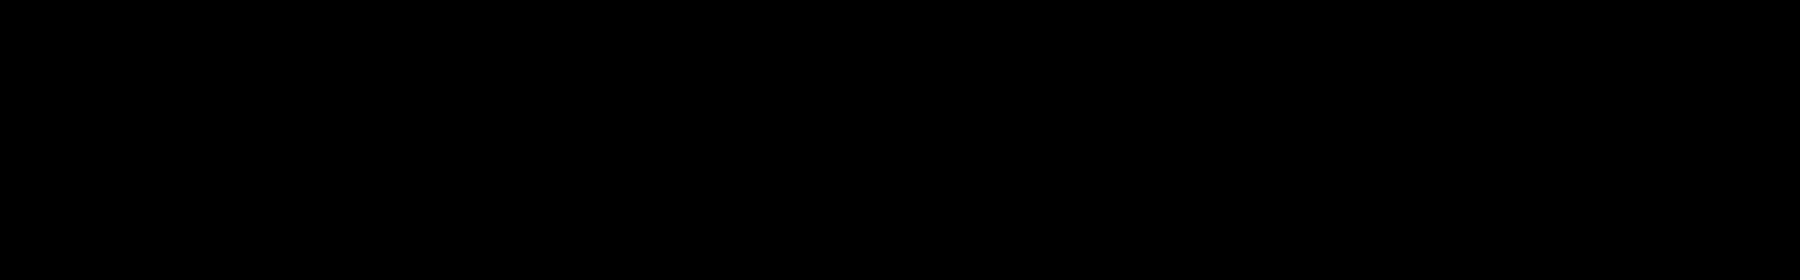 Retro Video Game FX audio waveform